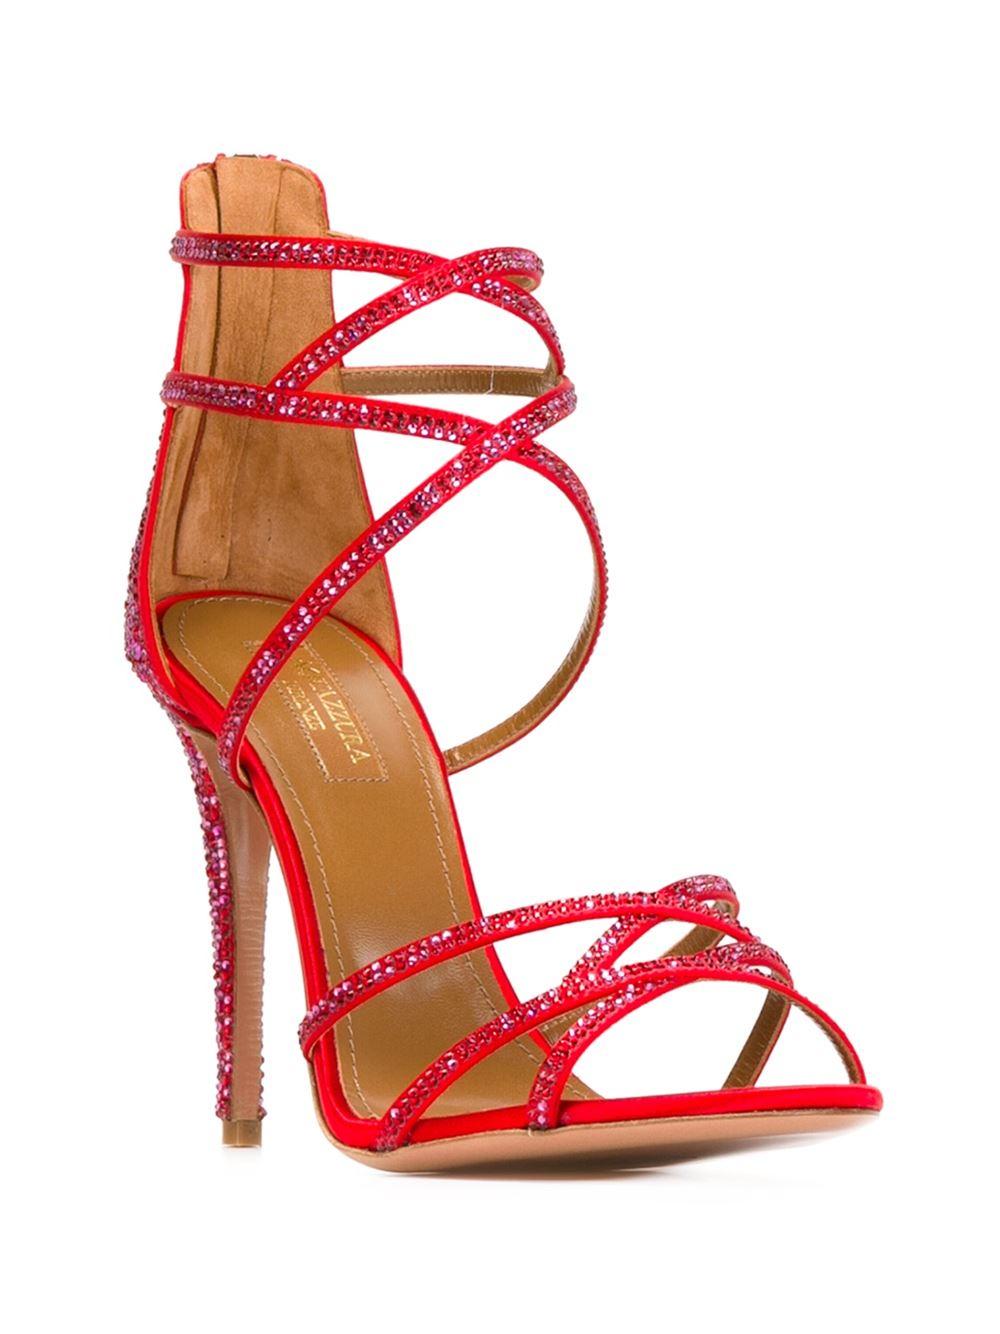 Aquazzura Embellished Strappy Stiletto Sandals In Red Lyst